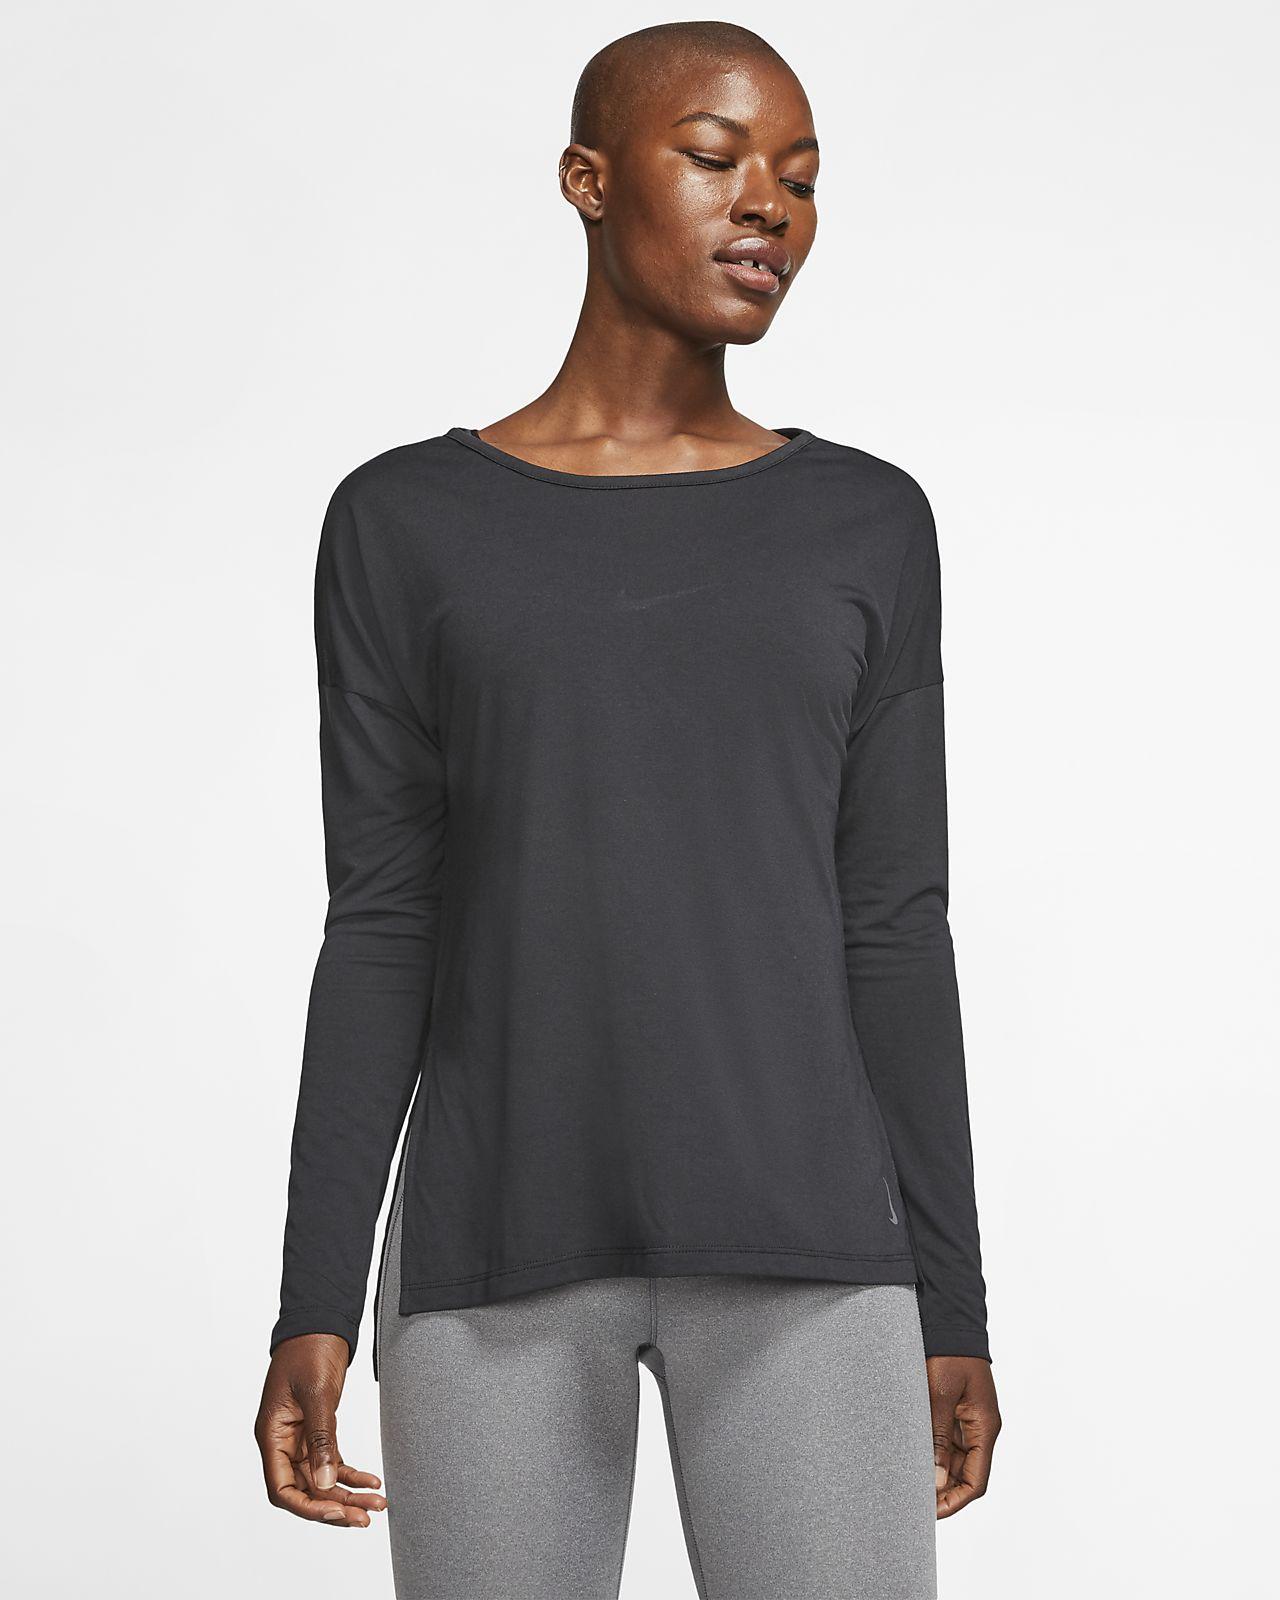 Nike Dri-FIT Yoga Women's Long-Sleeve Training Top